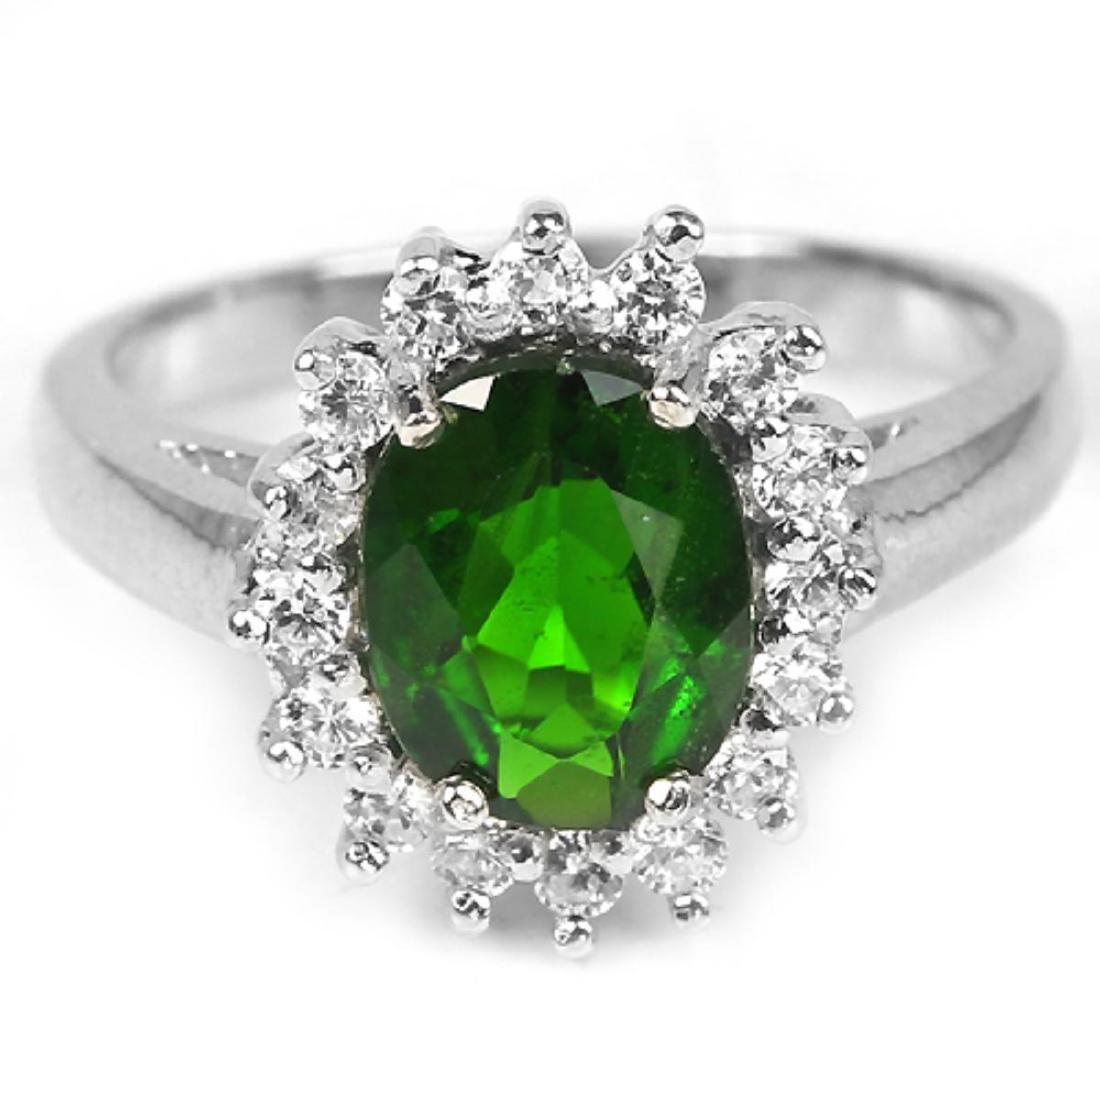 Natural Top Rich Green Peridot 296.64 Ct Bracelet